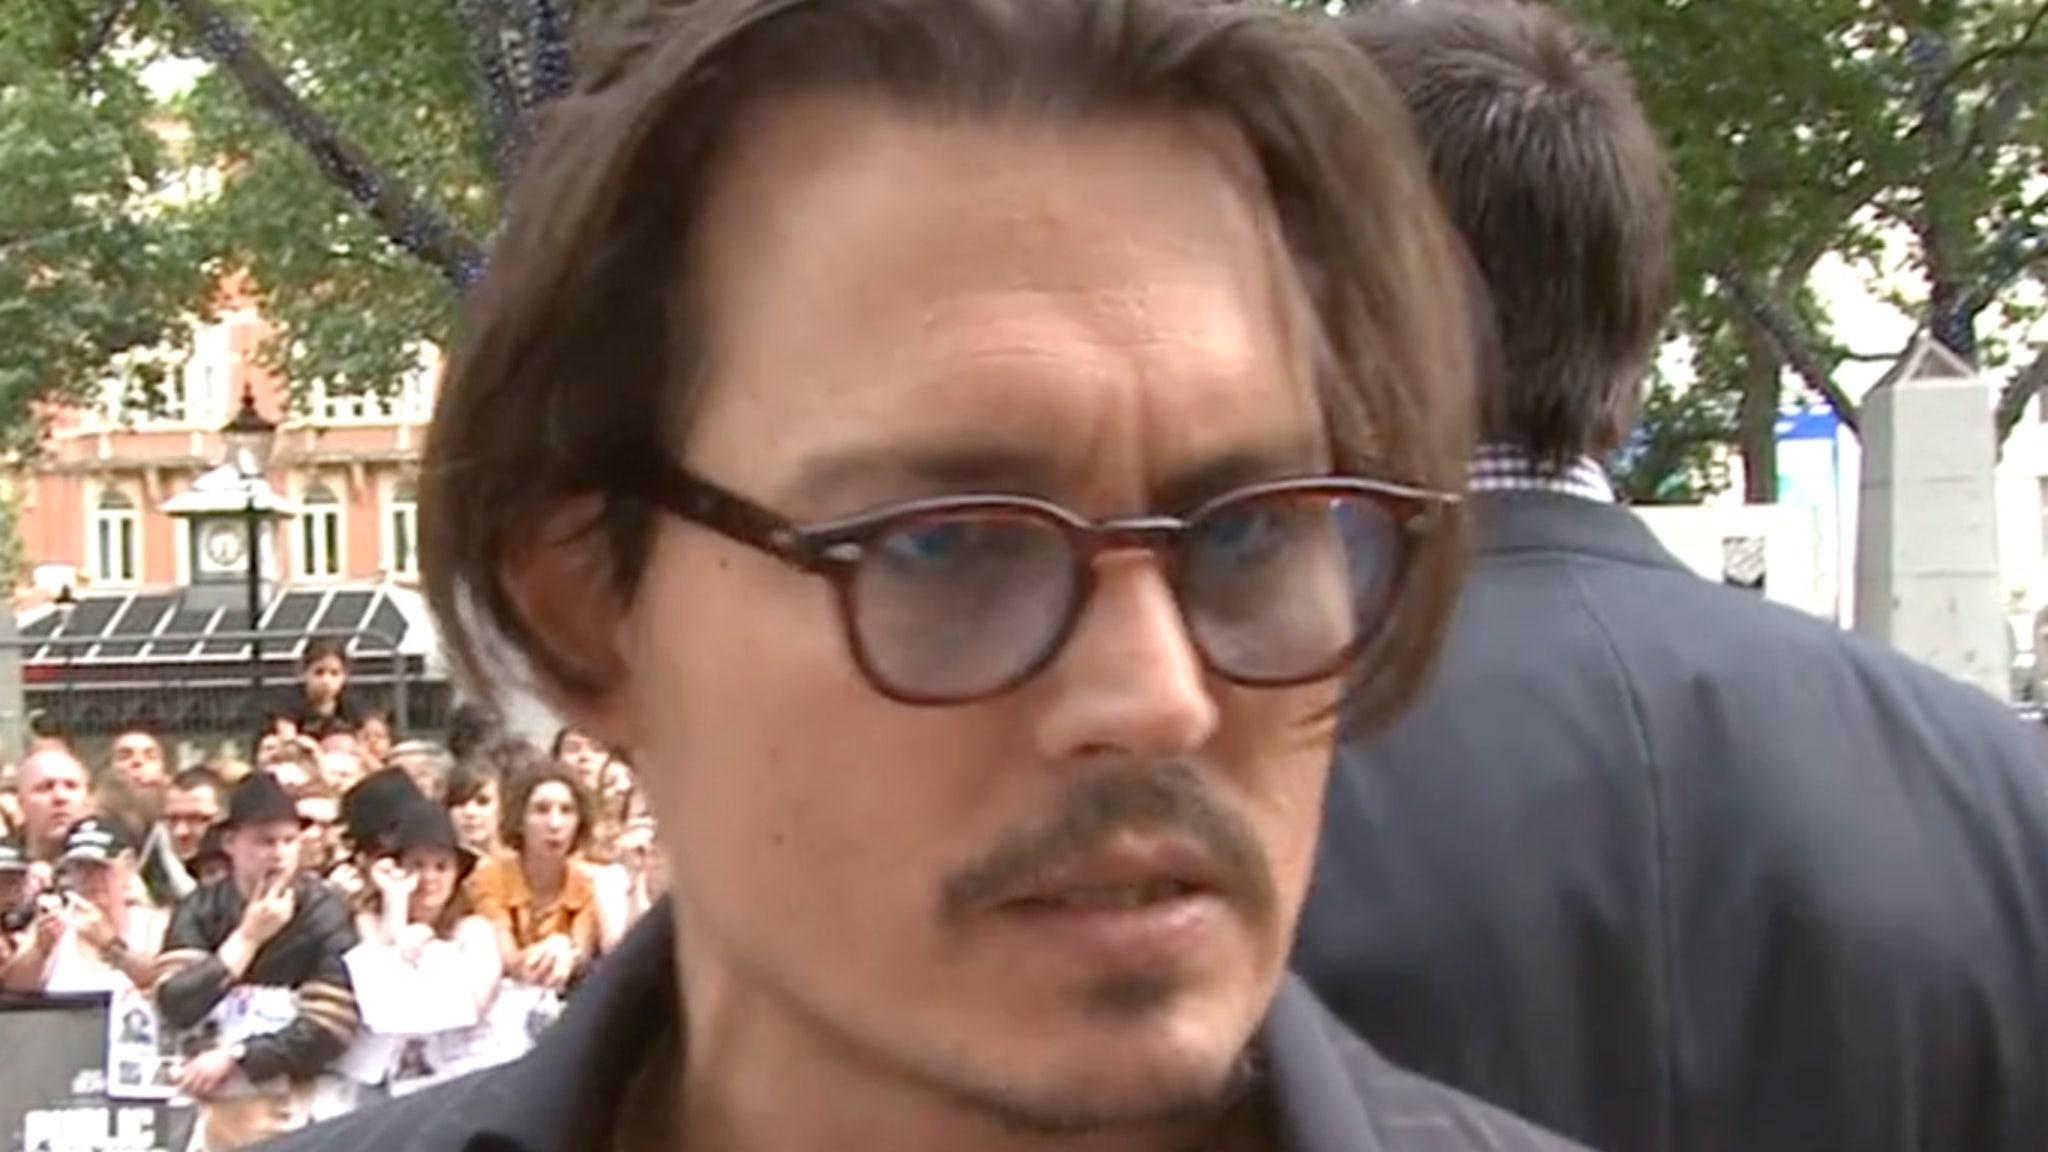 Johnny Depp Says Hollywood is Boycotting Him Over Amber Heard Saga thumbnail